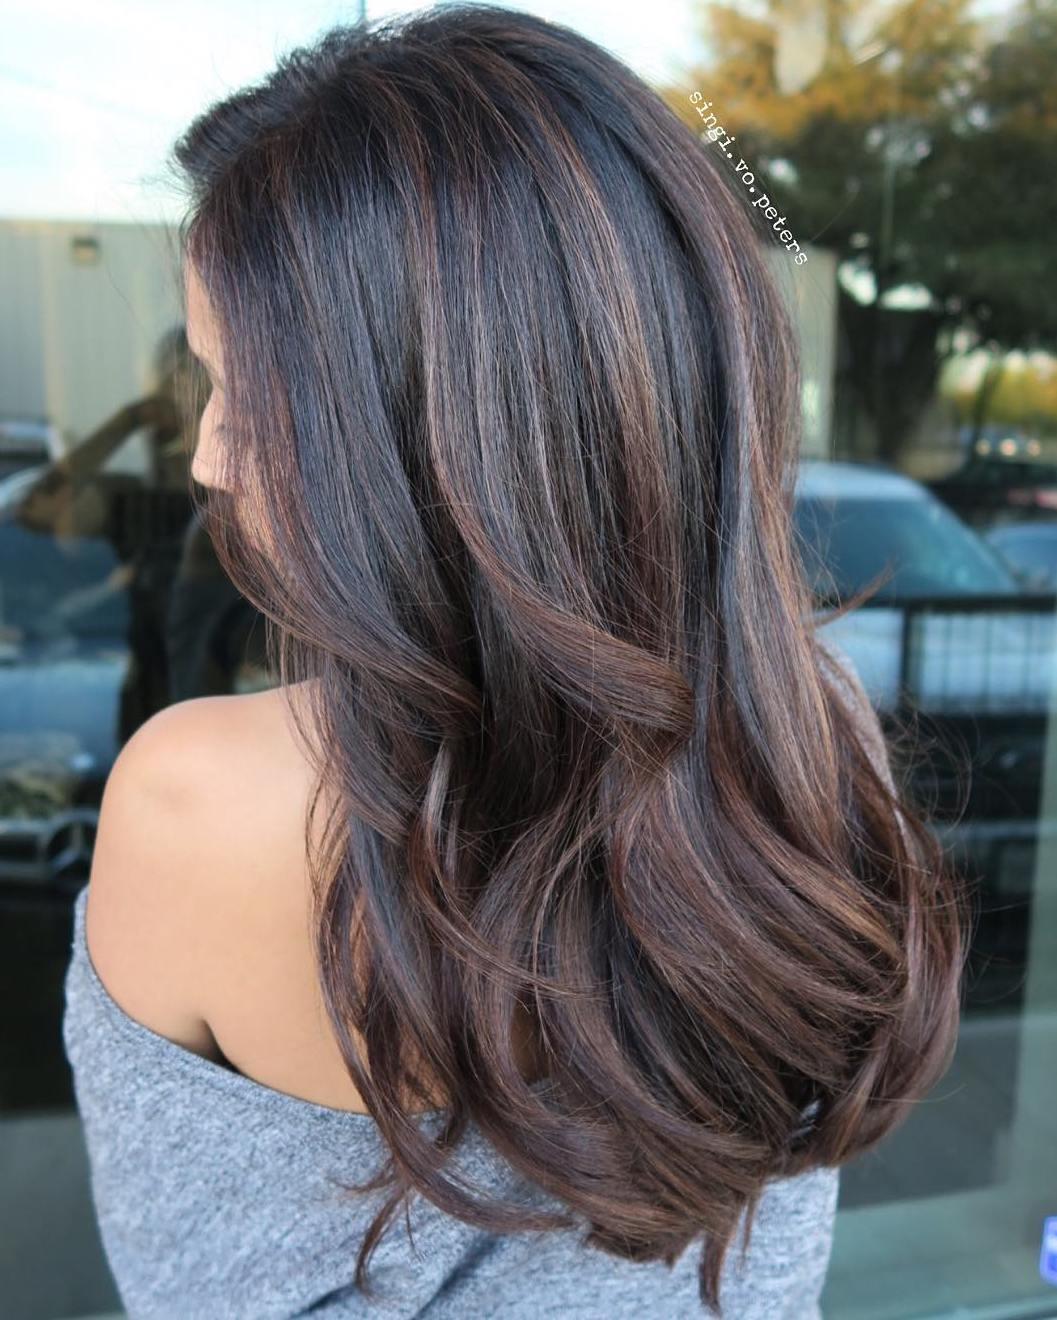 Dark Hair Multi Color Highlights Hrotelrehberii